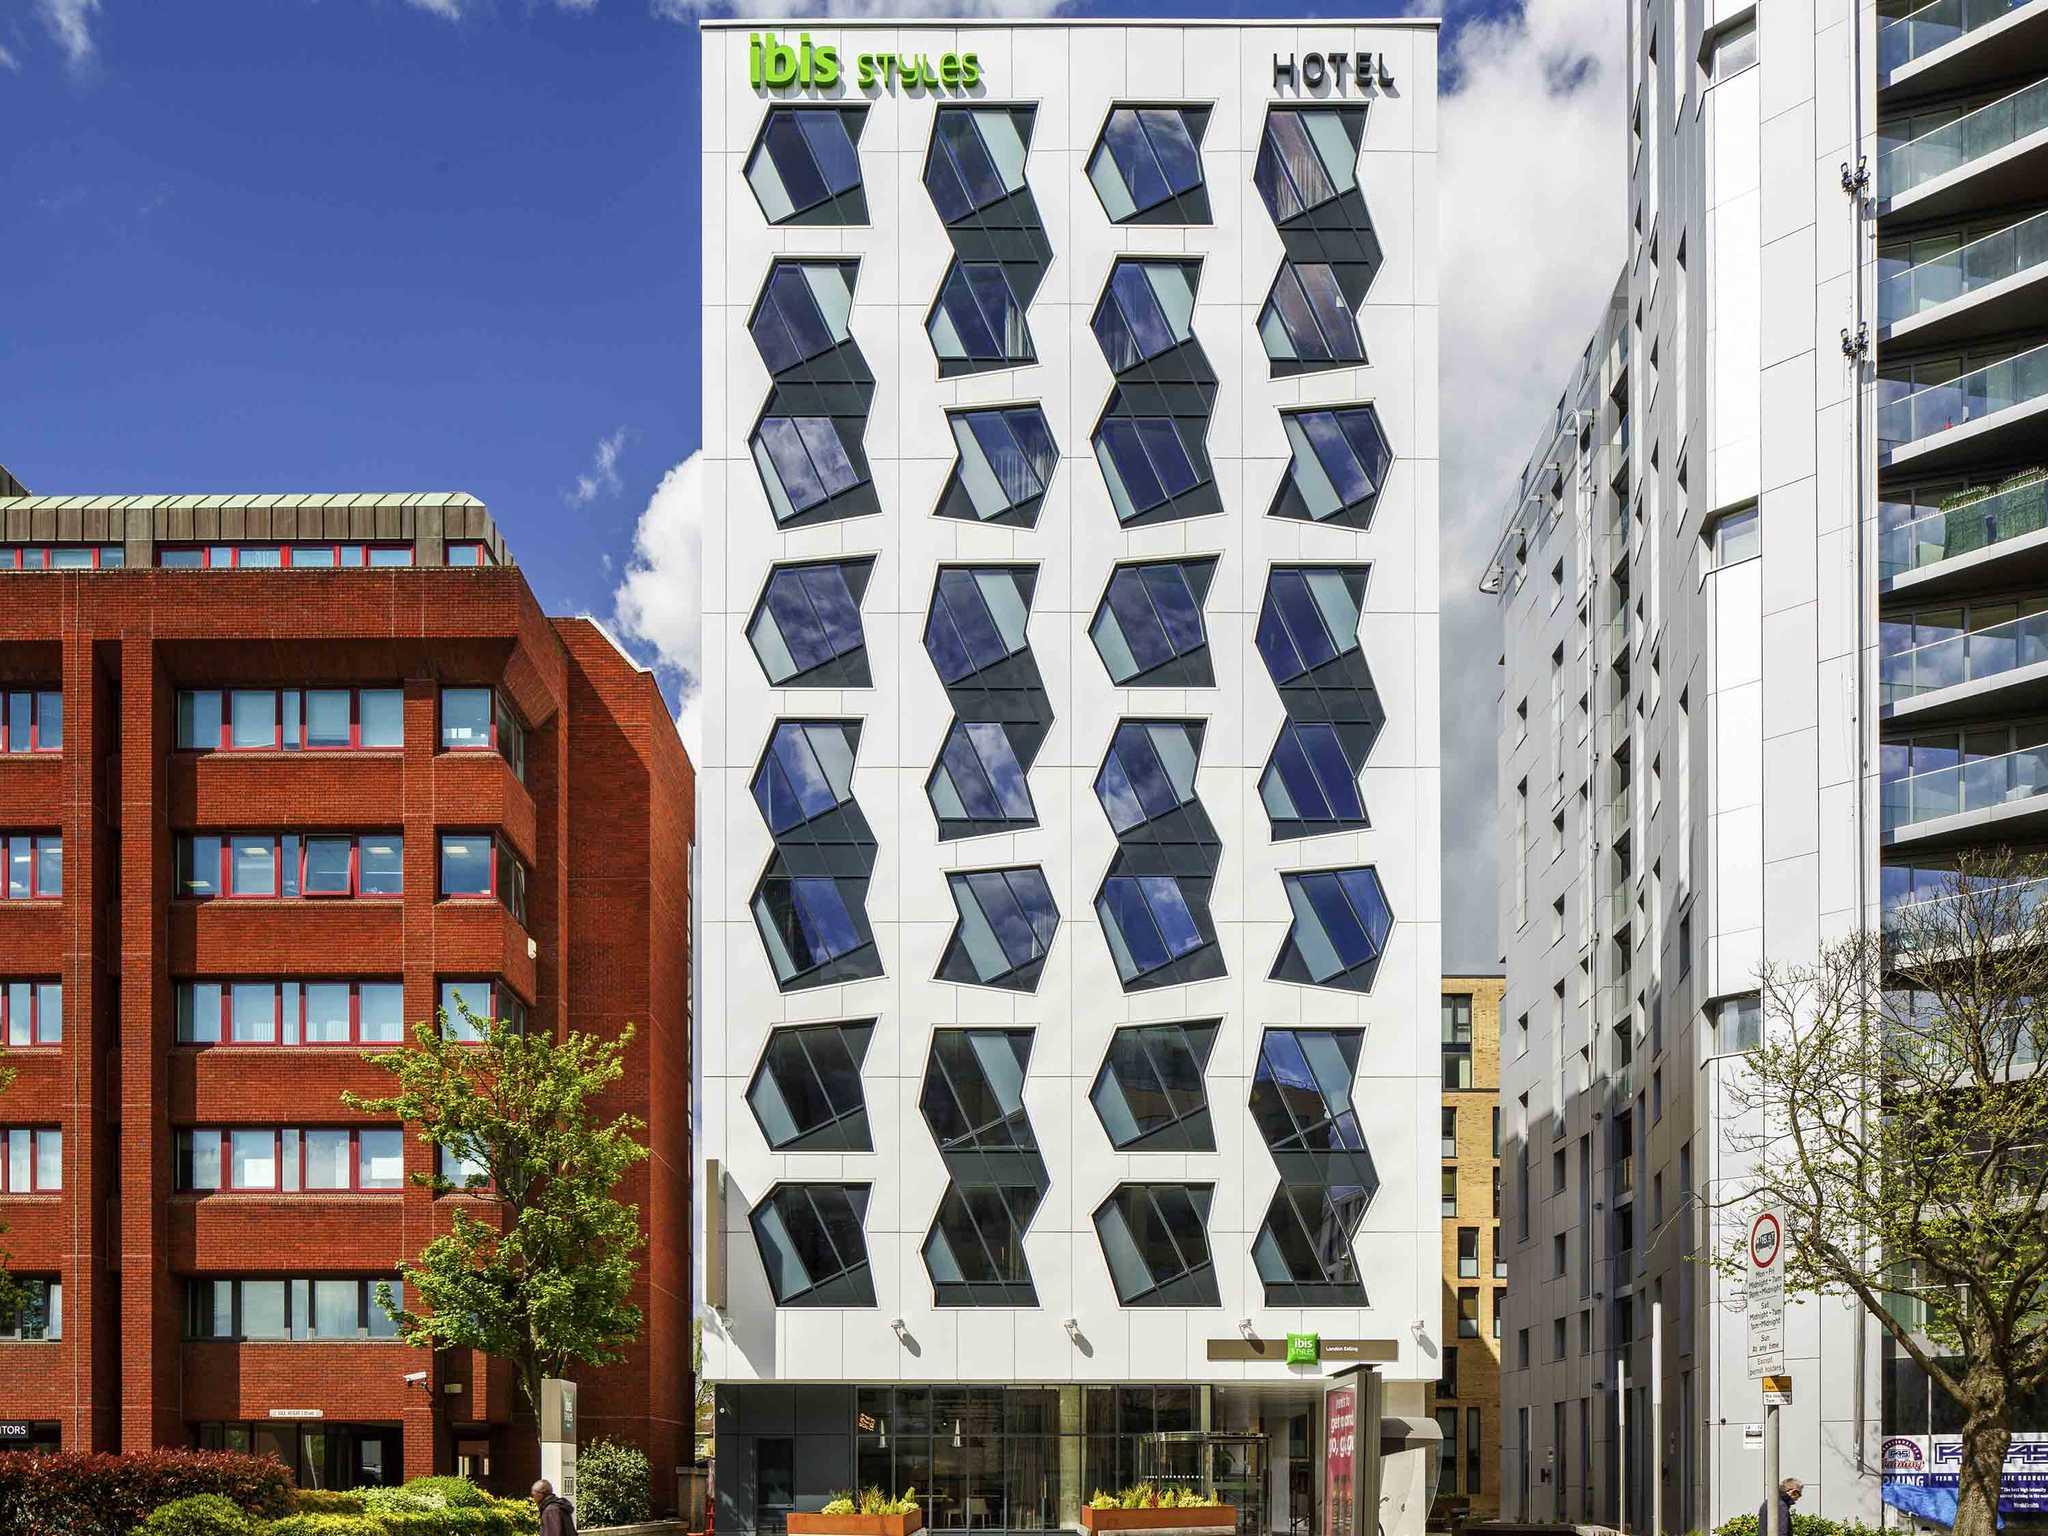 Otel – Ibis Styles London Ealing (Açılış: Haziran 2018)